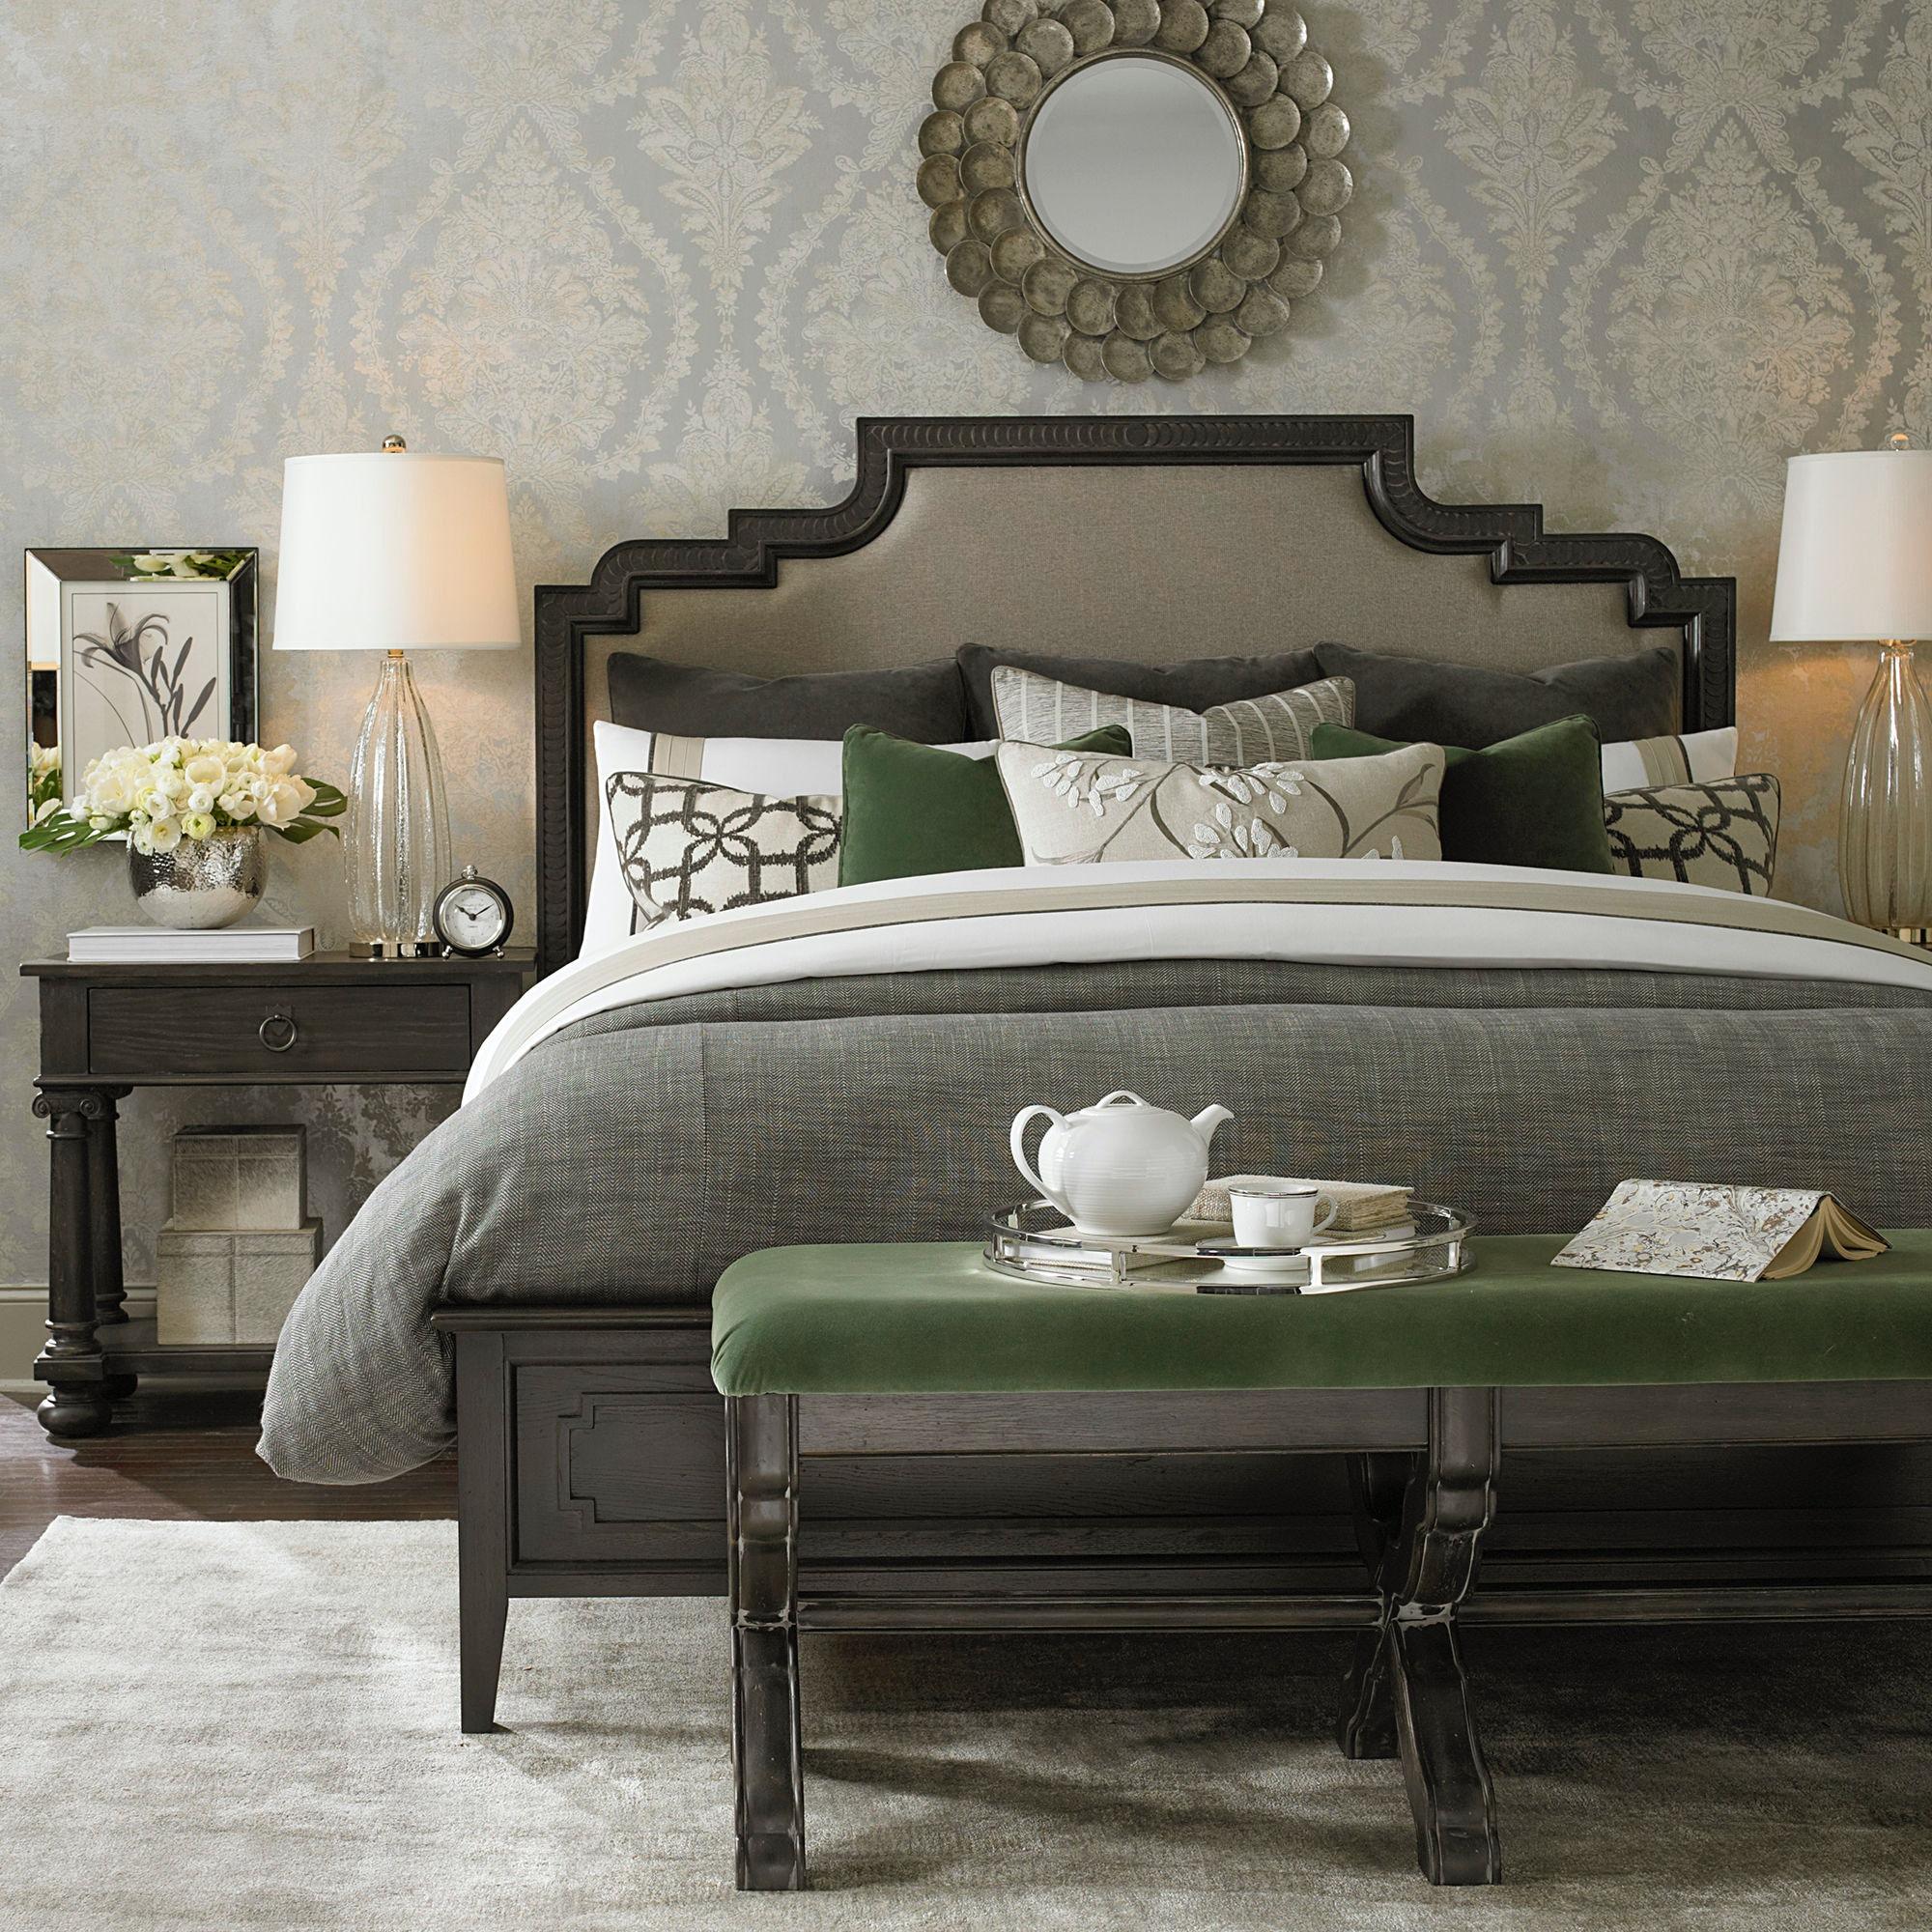 Bedroom Sets Rockford Il bedroom bedding - gustafson's furniture and mattress - rockford, il